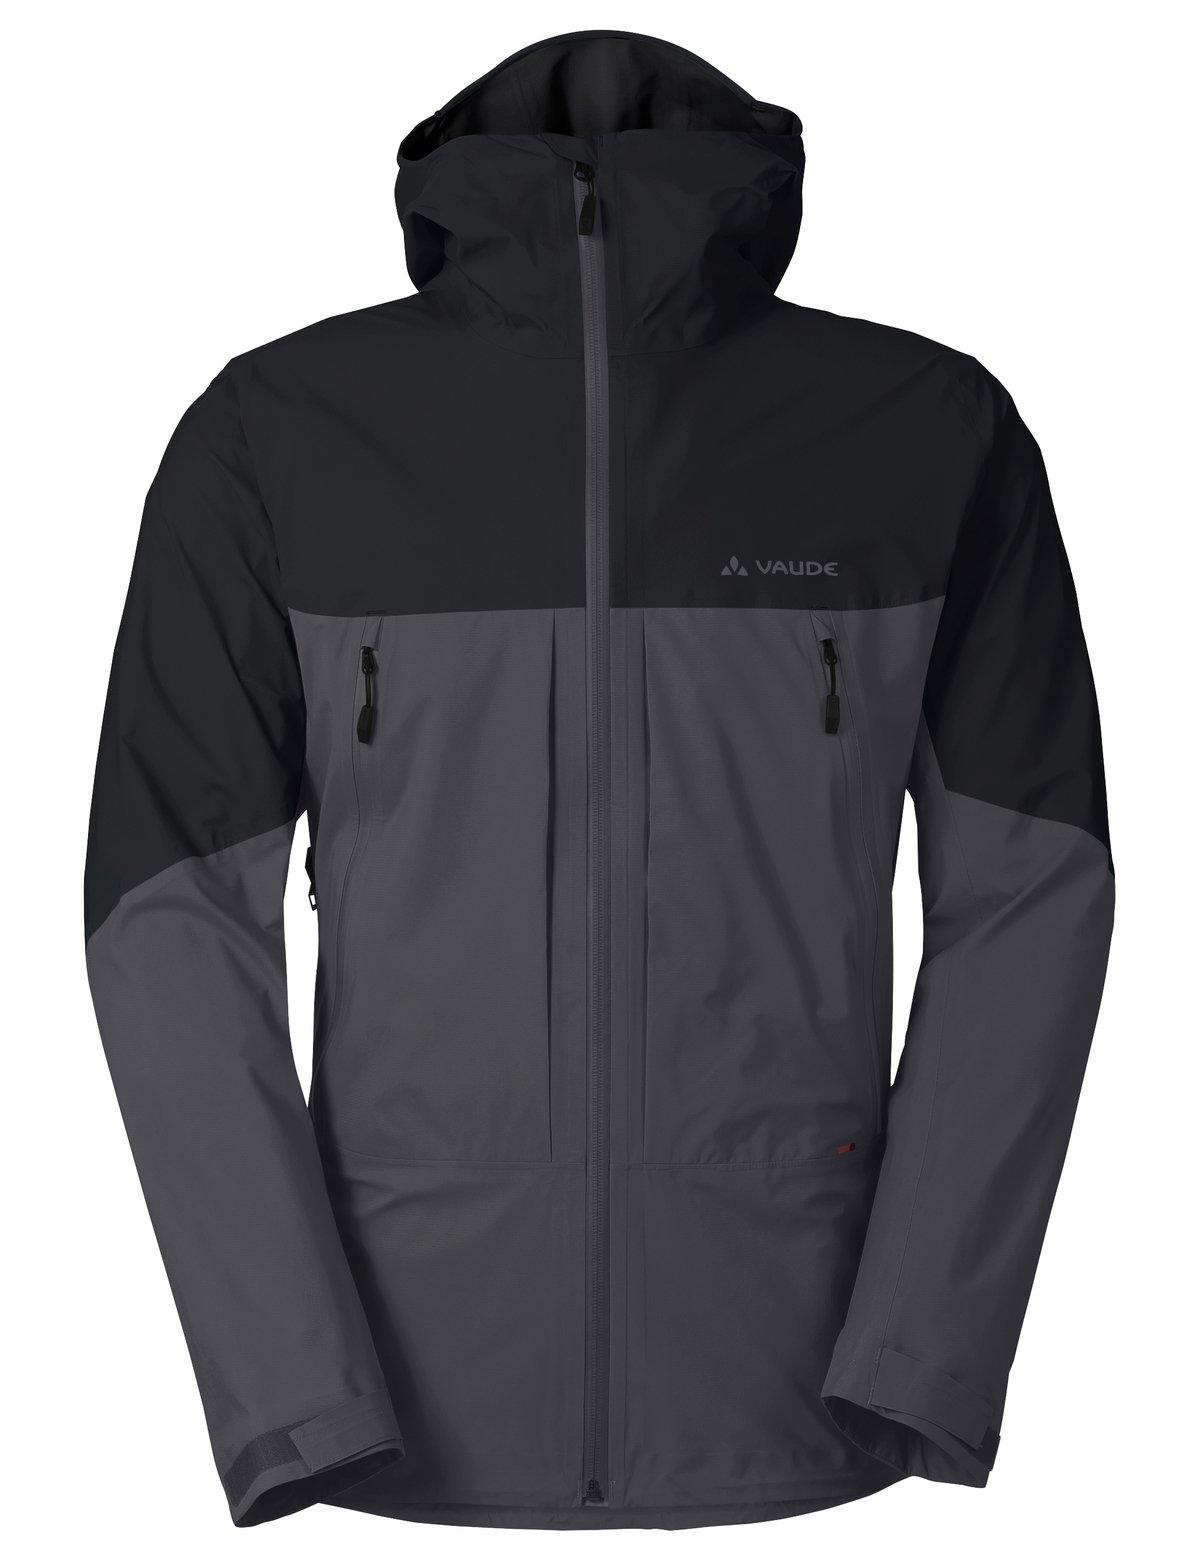 VAUDE Men's Croz 3L Jacket, Iron, Medium